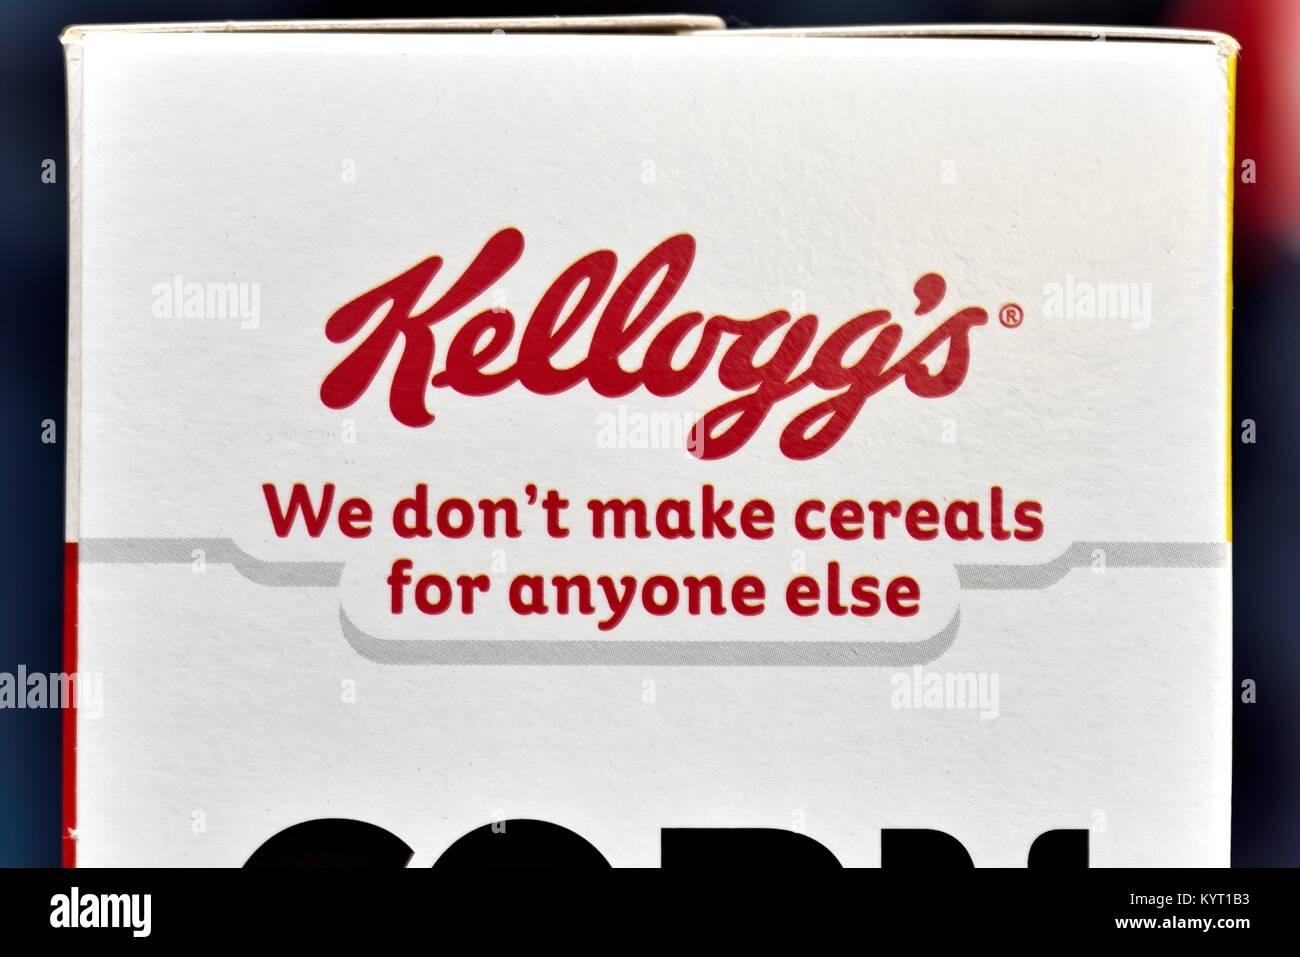 Kelloggs we don't make cereals for anyone else marketing slogan - Stock Image